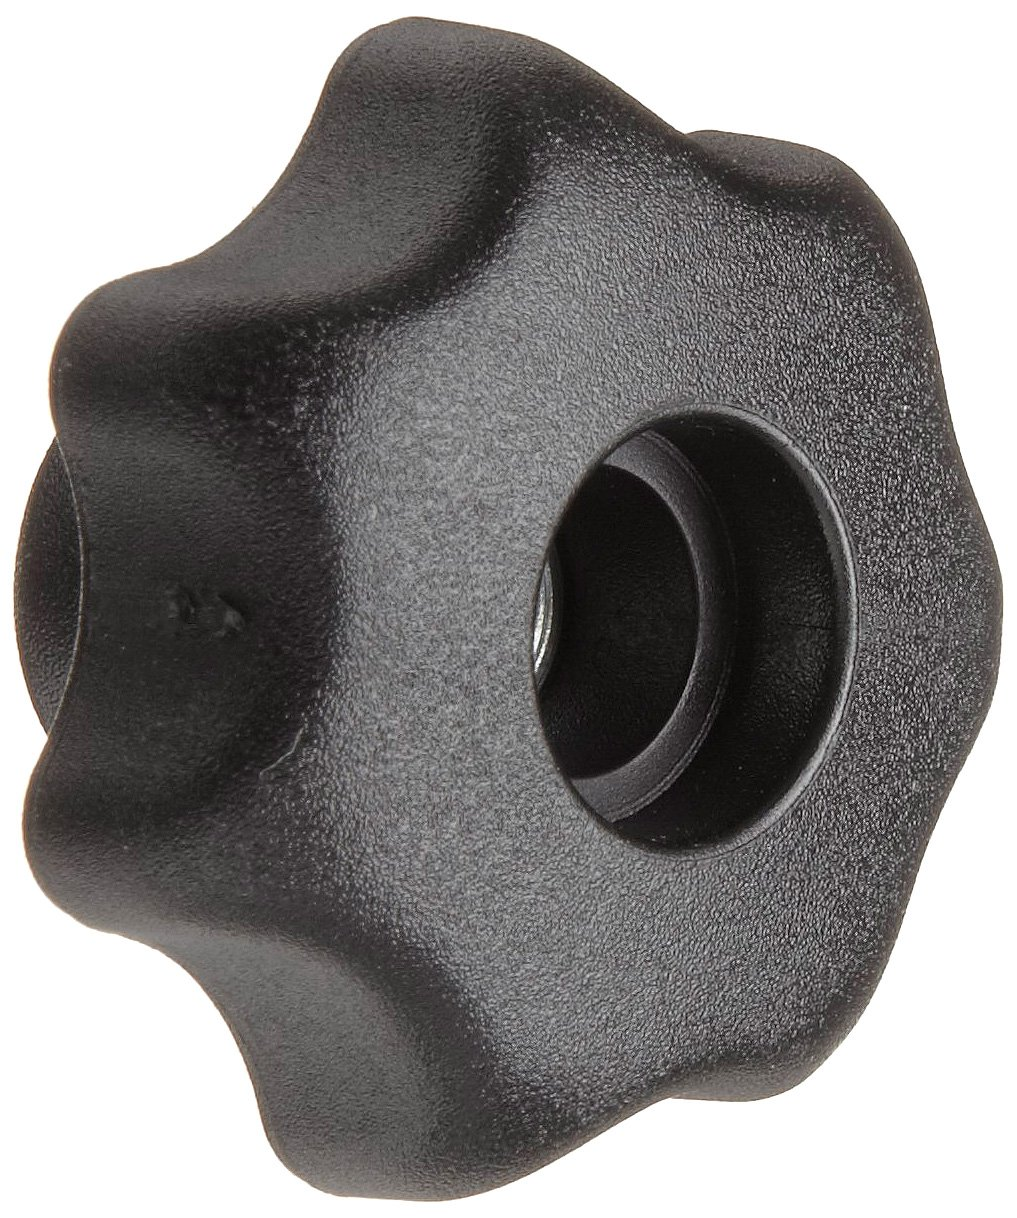 Morton Glass Fiber Reinforced Polymide Multiple Lobe Knob, Fluted Rim, Threaded Hole, M10 Thread Size x 15mm Thread Length, 50mm Diameter (Pack of 2)